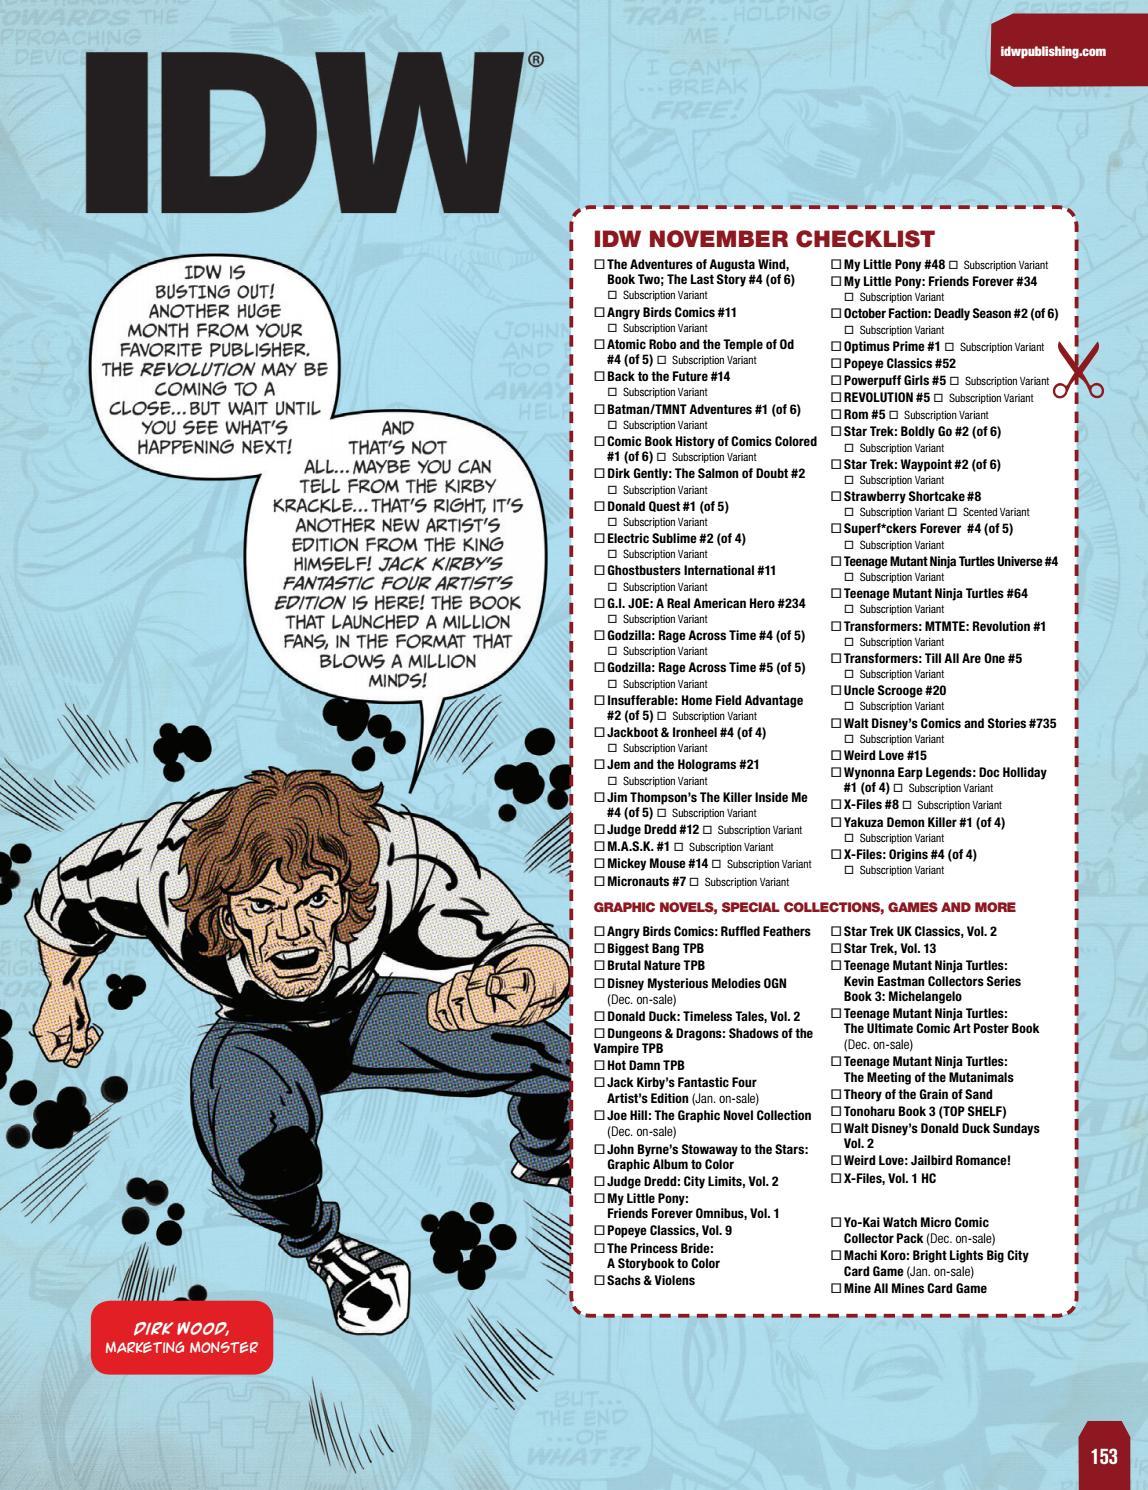 IDW COMICS COVER A JUDGE DREDD #7 DUANE SWIERCZYNSKI ONGOING